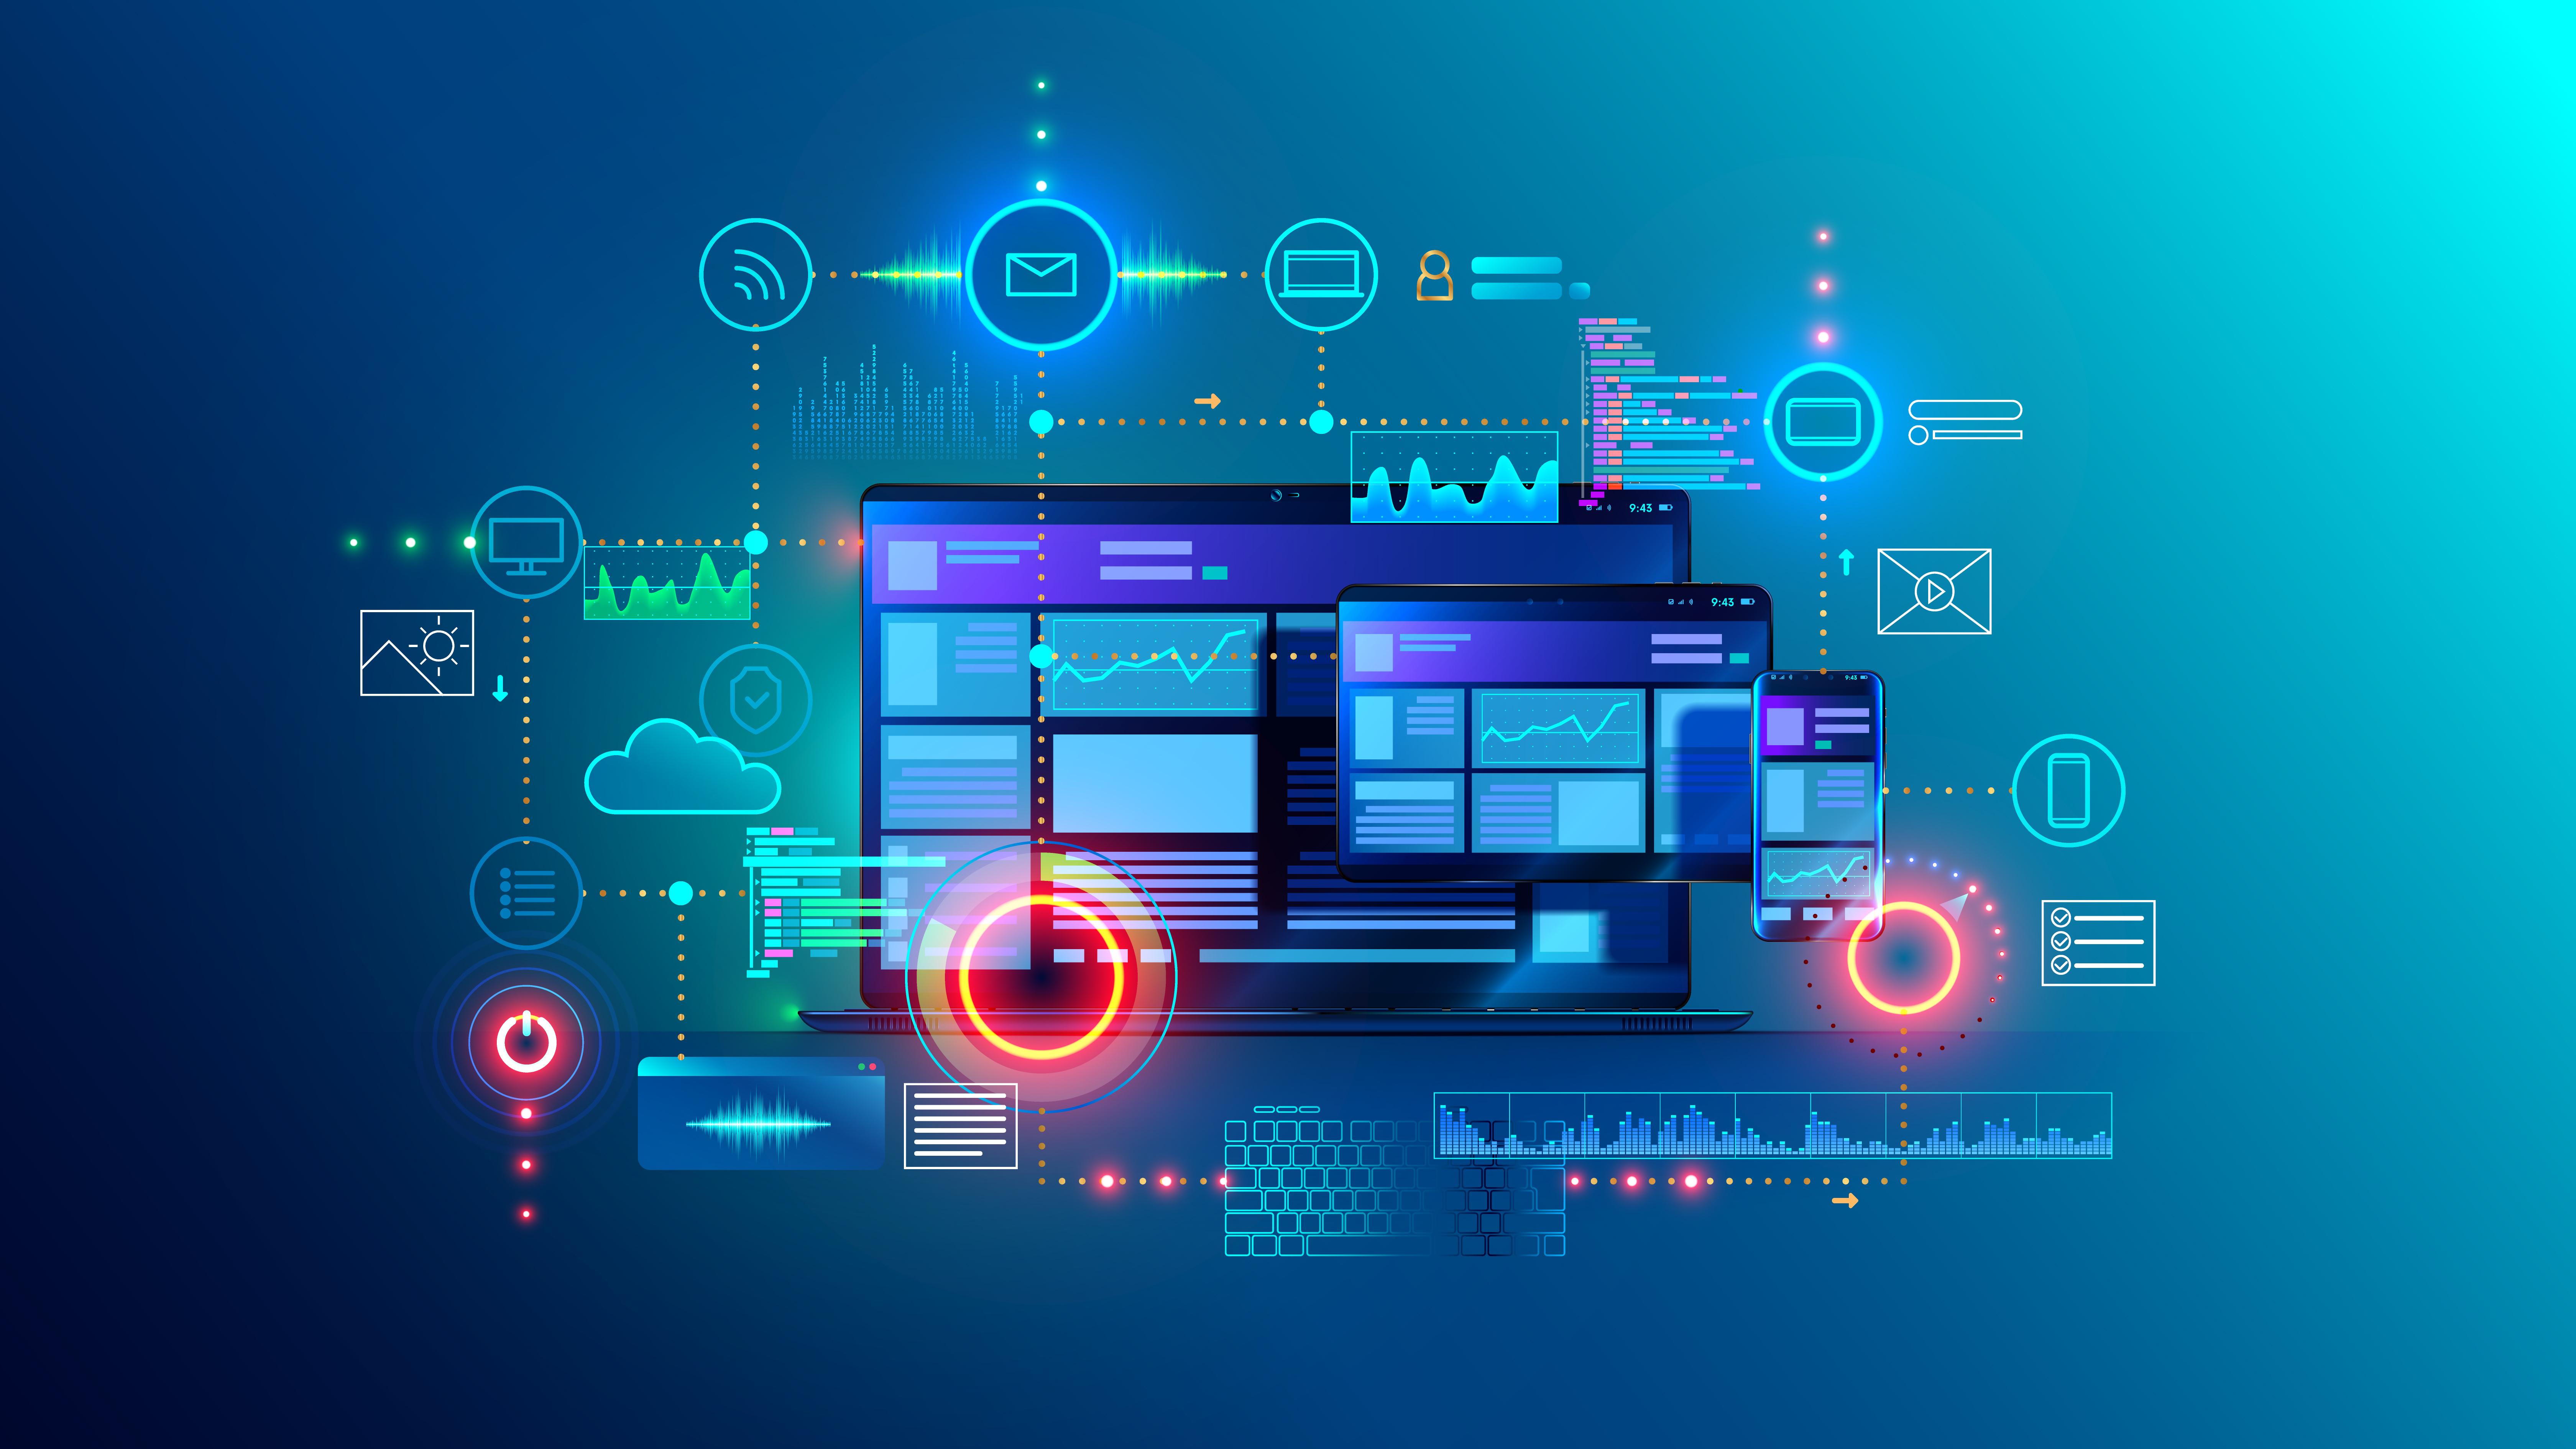 Digital Services Illustration